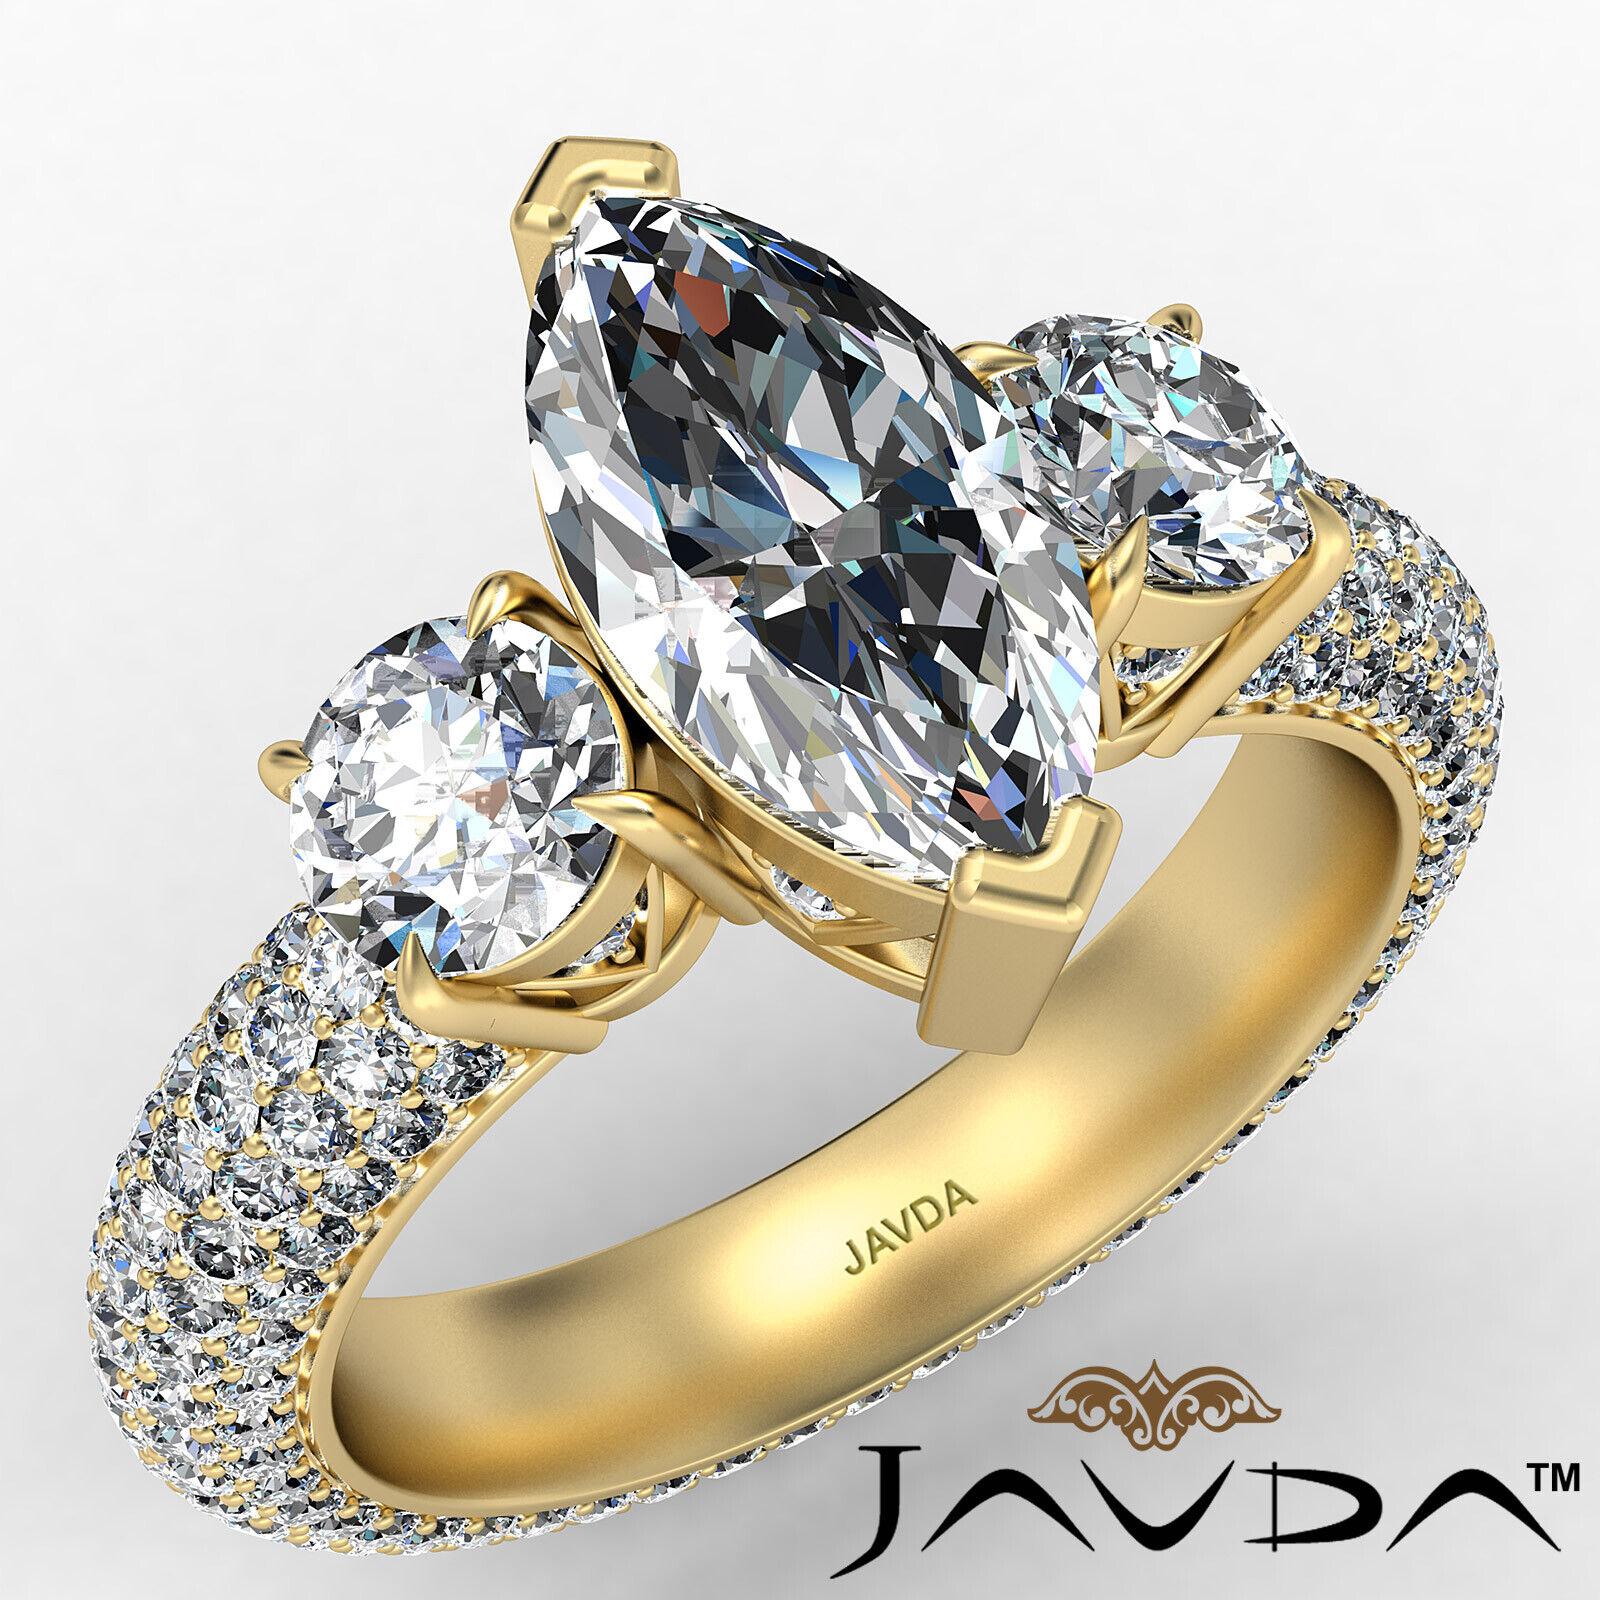 Marquise Diamond Engagement Pave Set Ring GIA K Color & VVS2 clarity 3.05 ctw 1